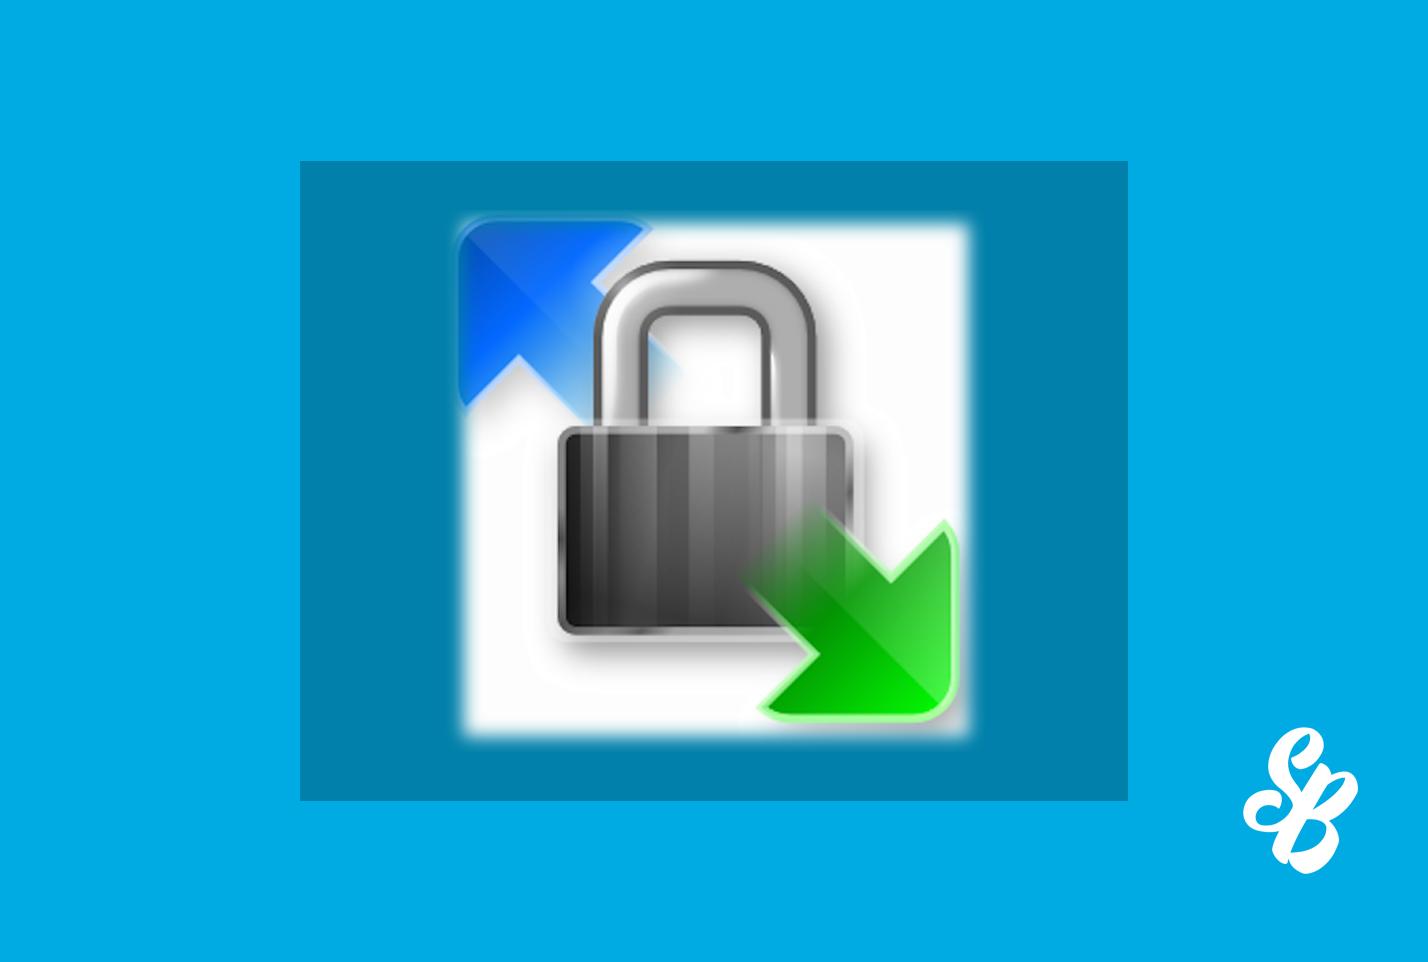 Cara Mengganti File Tampilan Hotspot Mikrotik Menggunakan FTP